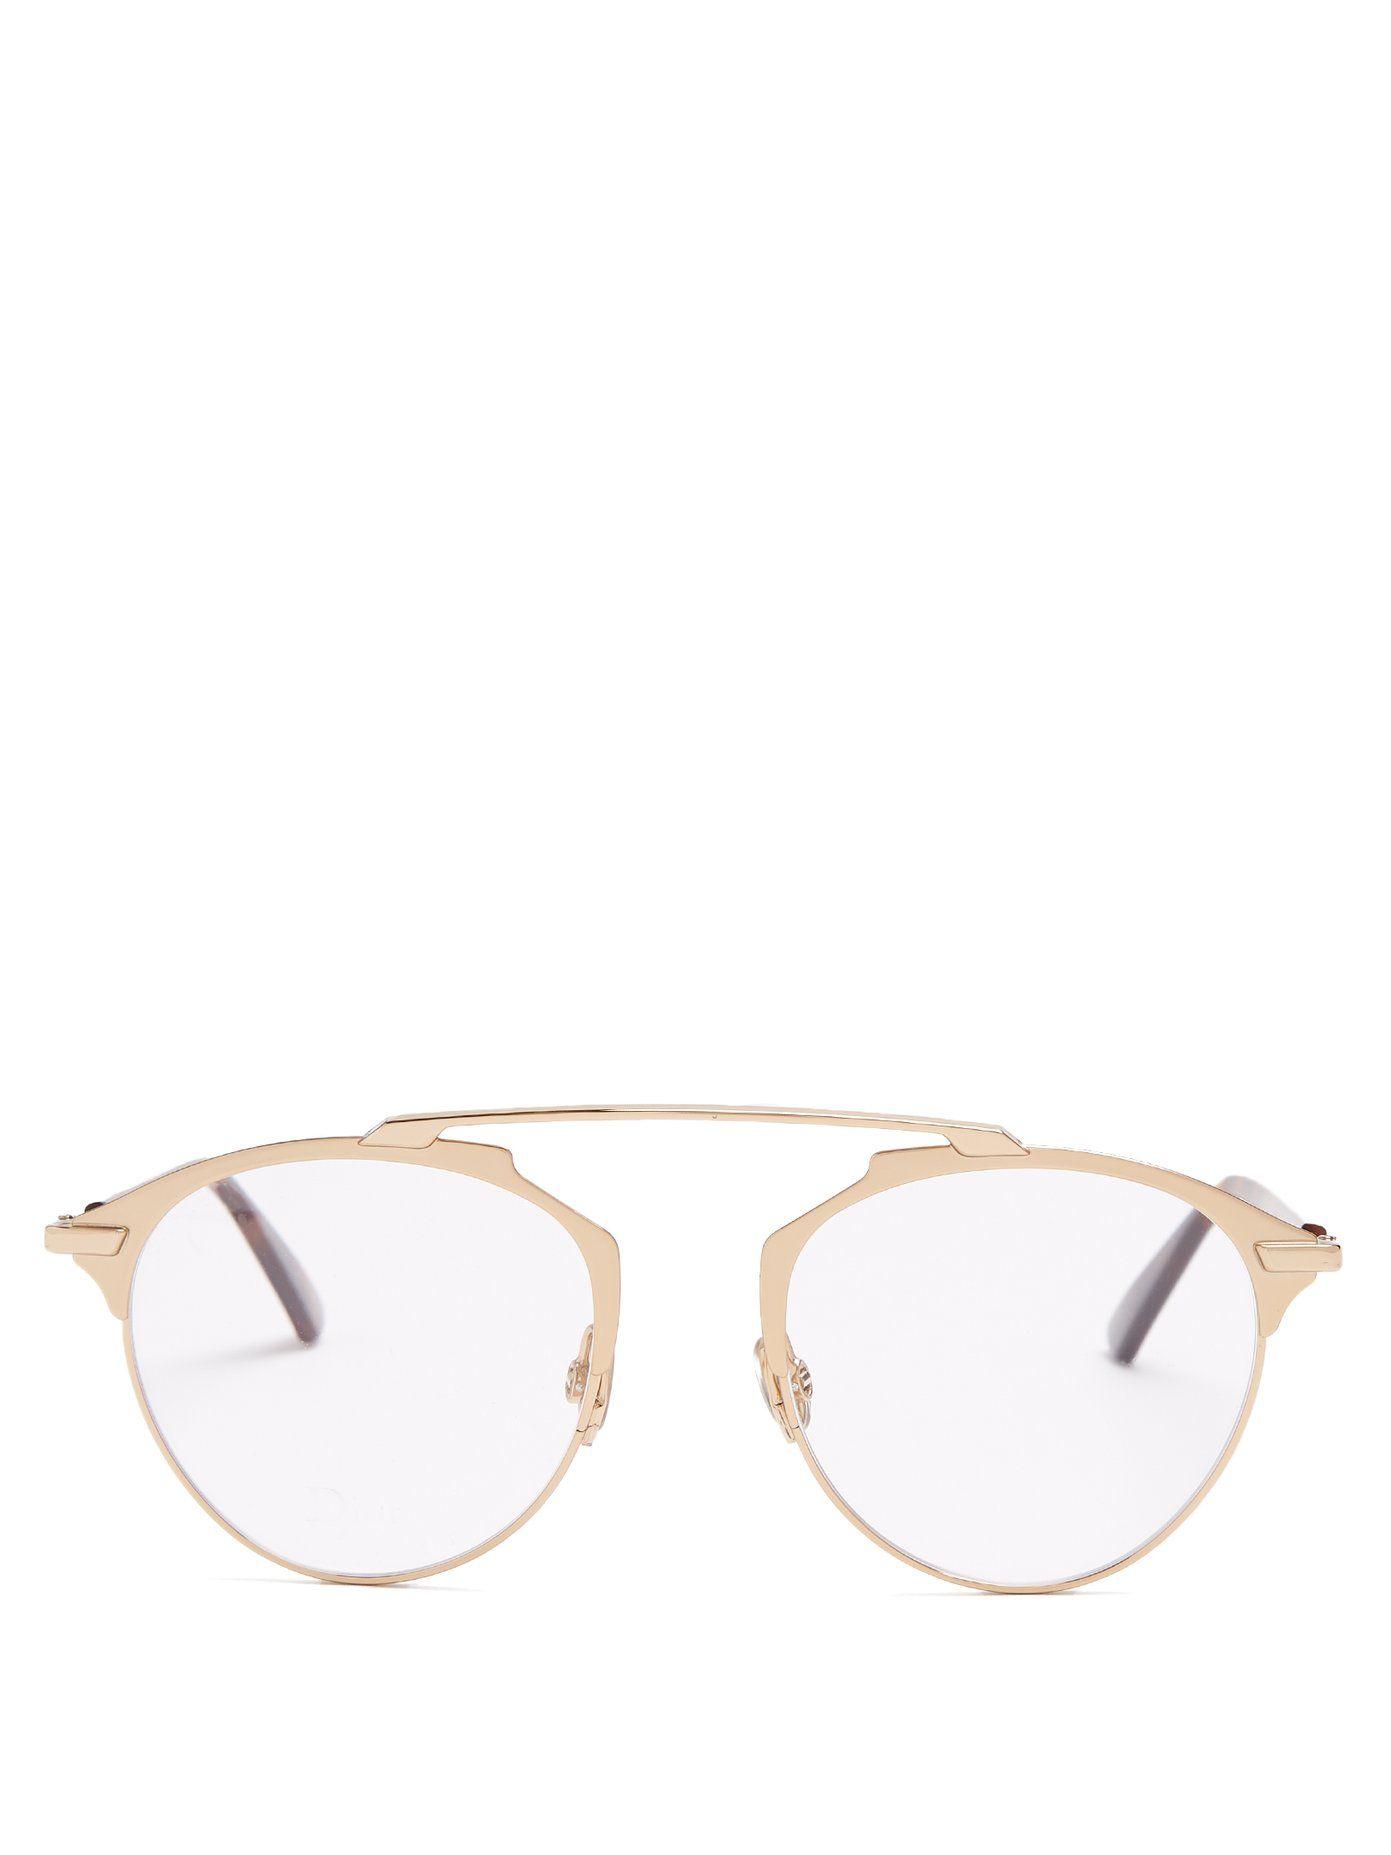 DiorSoReal tortoiseshell aviator-frame sunglasses Dior 8bqWkpp